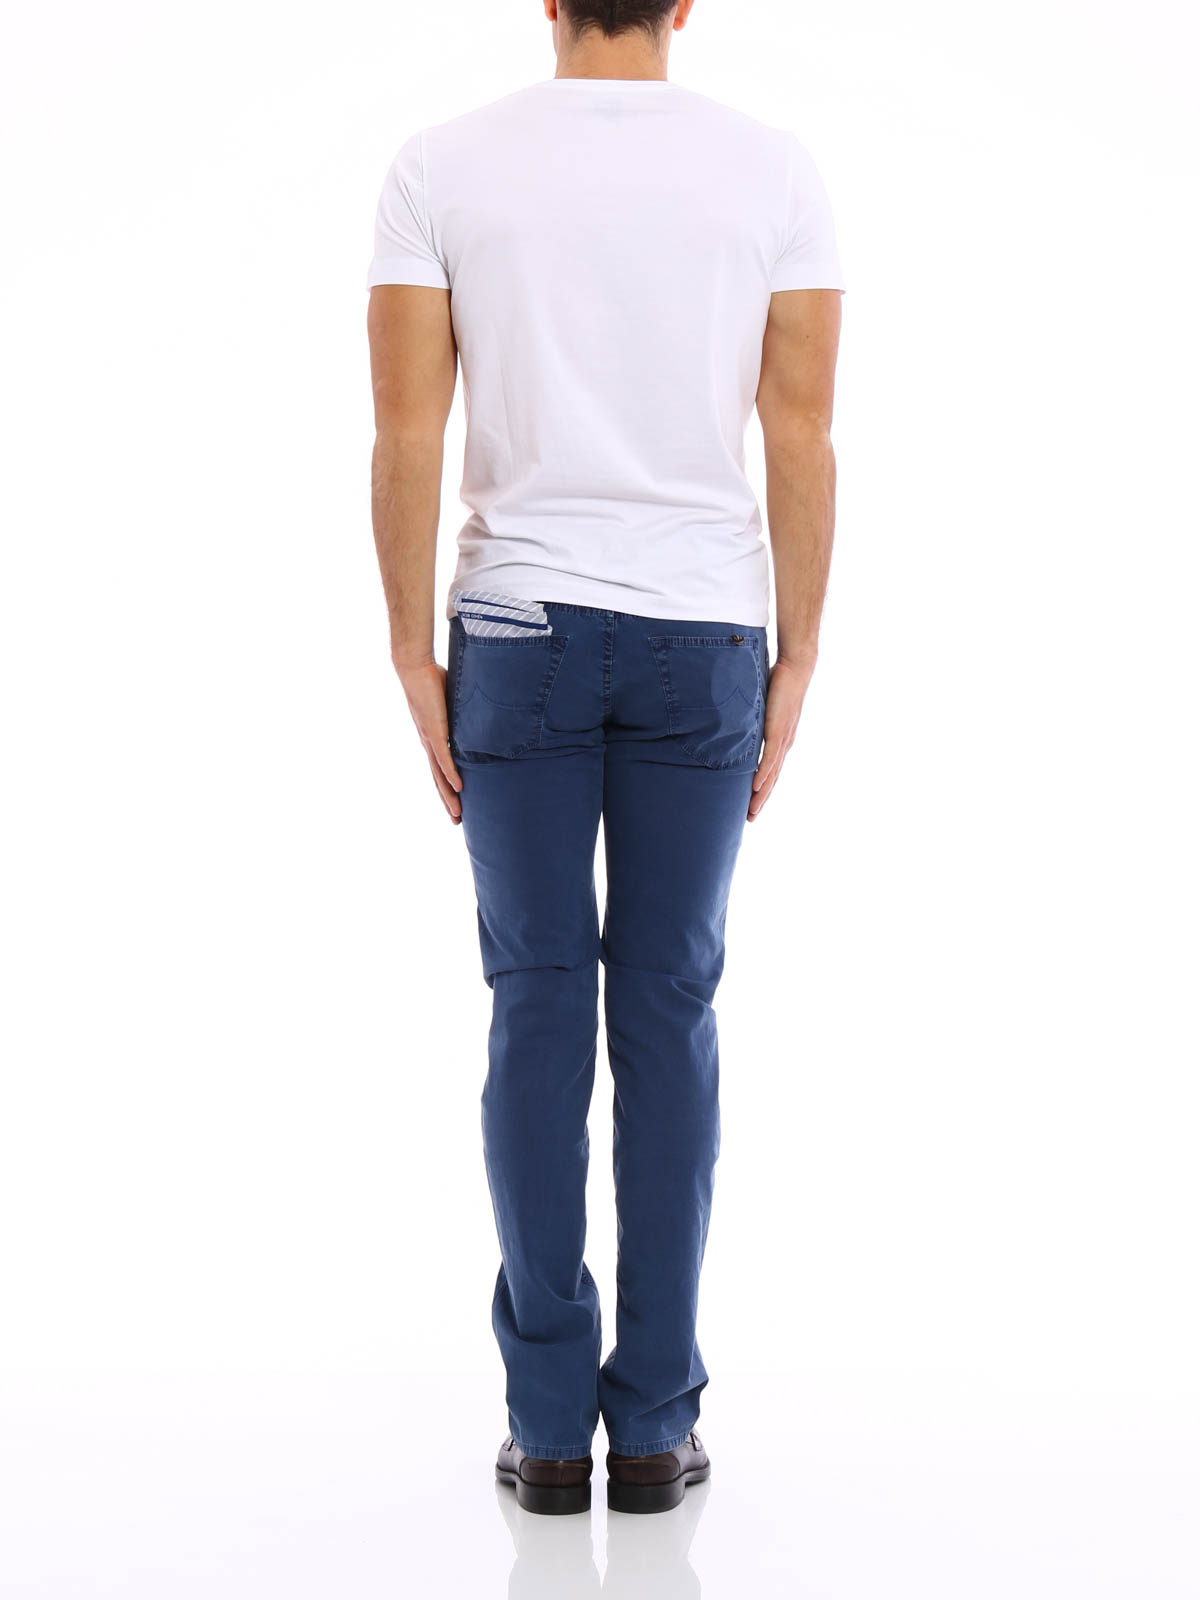 jeans jacquard jacob cohen jeans dritti a sigaretta ikrix. Black Bedroom Furniture Sets. Home Design Ideas